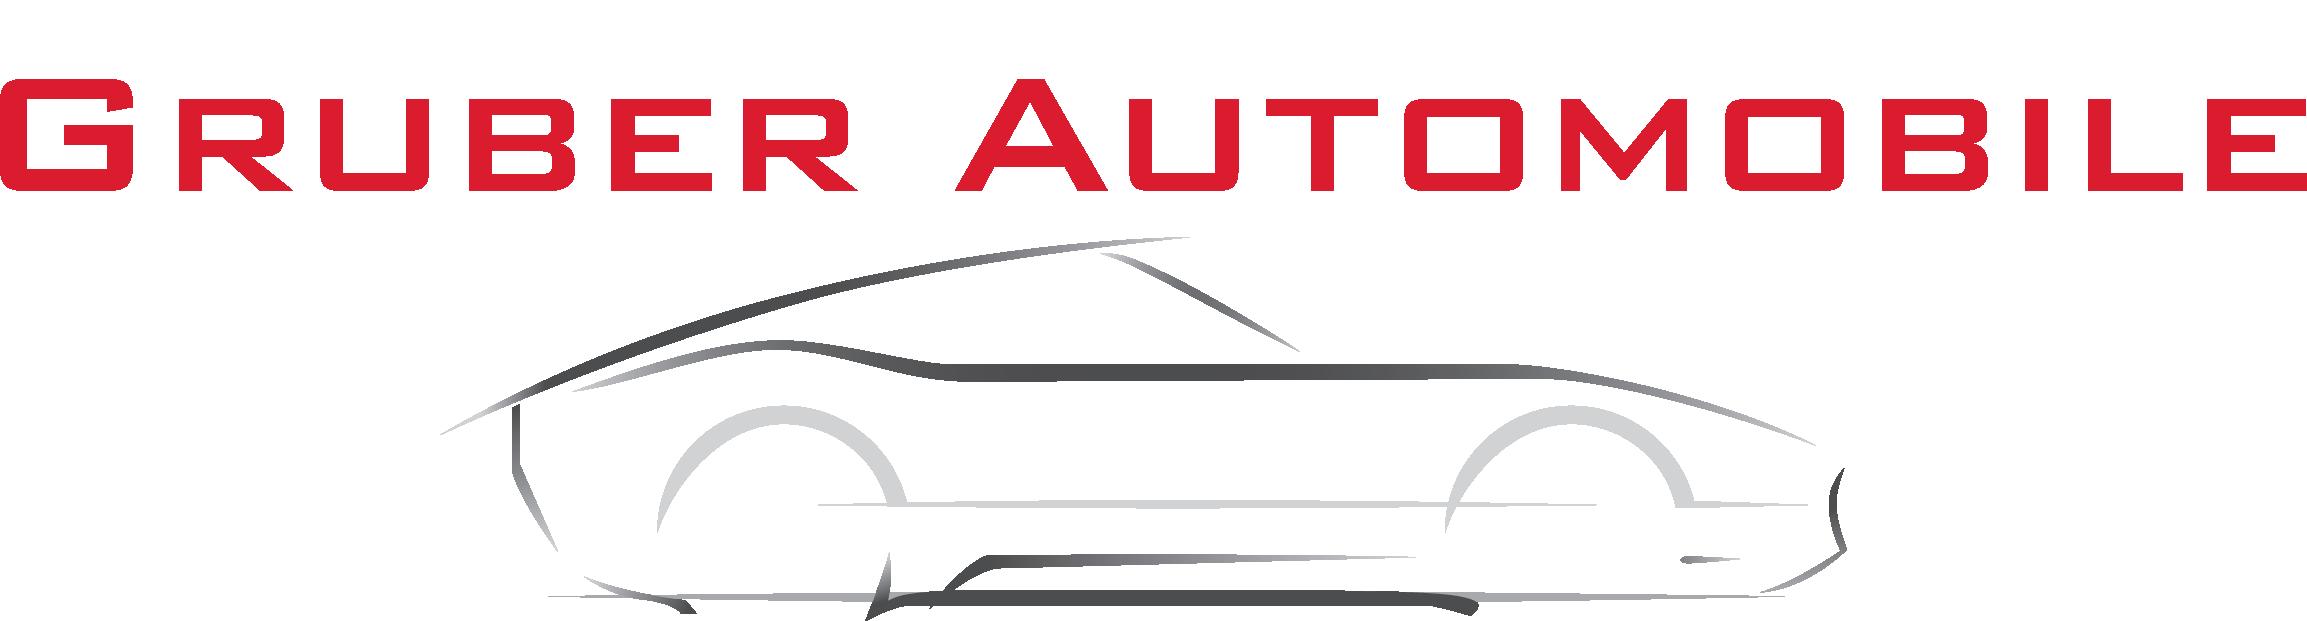 logo auto ecole